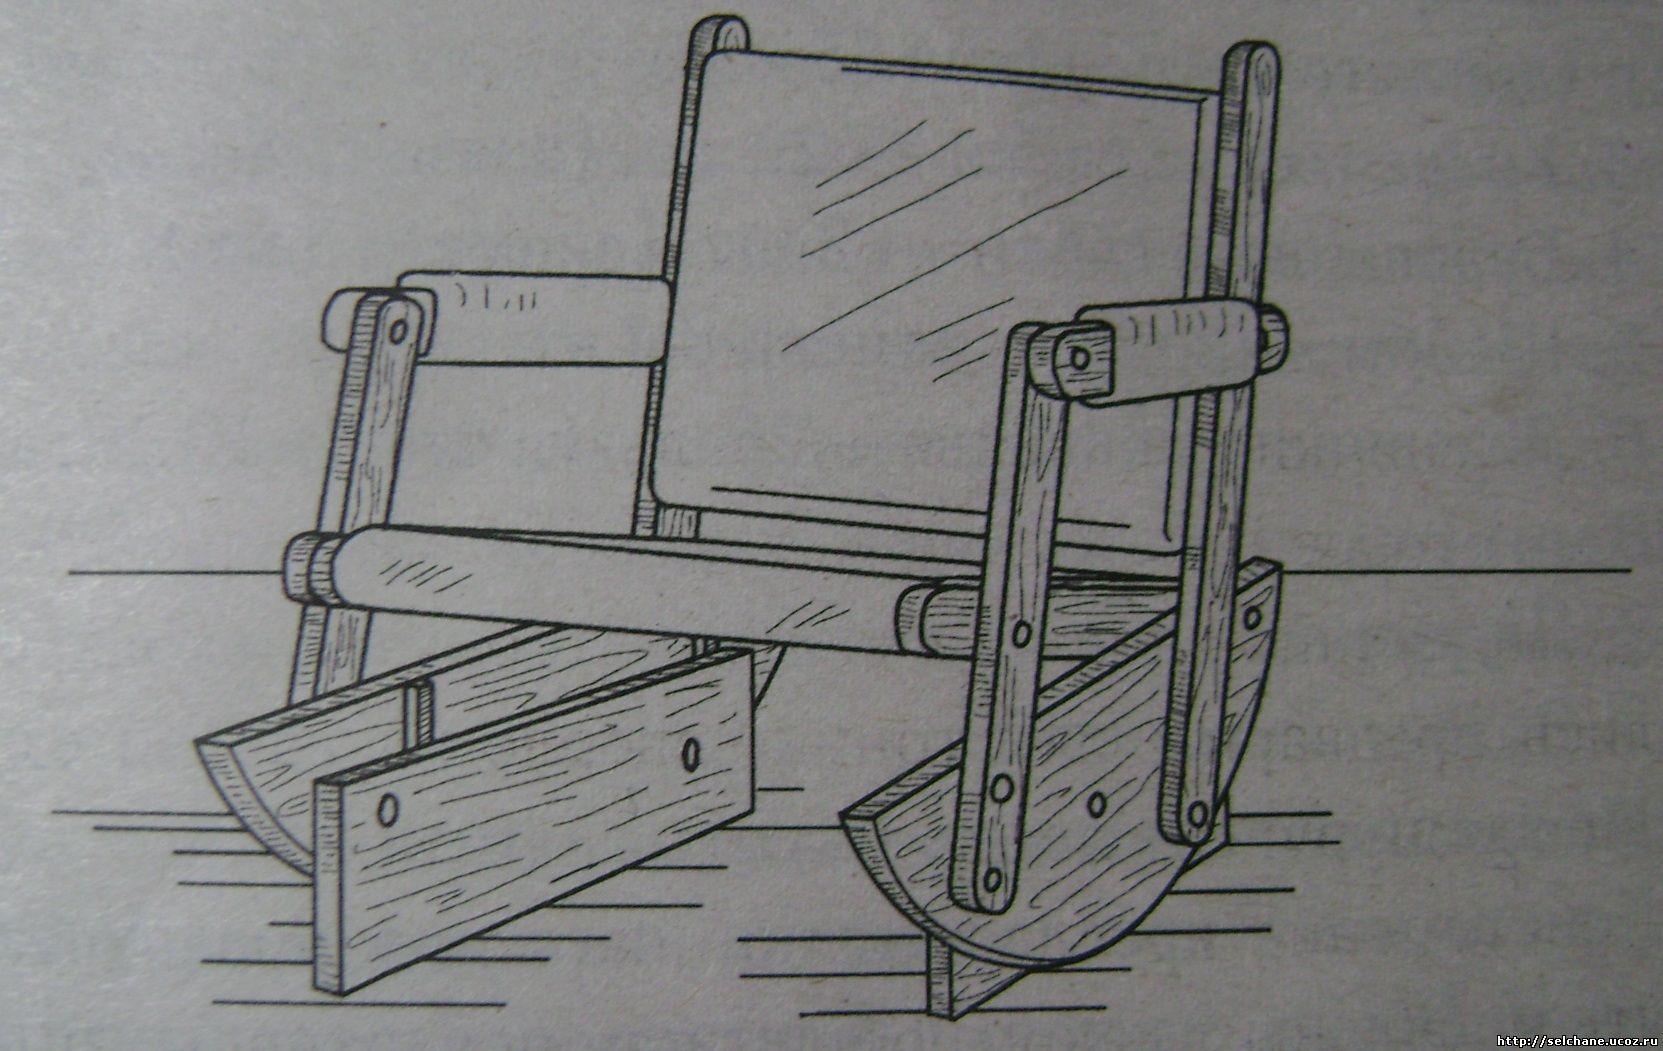 Кресло качалка своими руками в домашних условиях фото 971